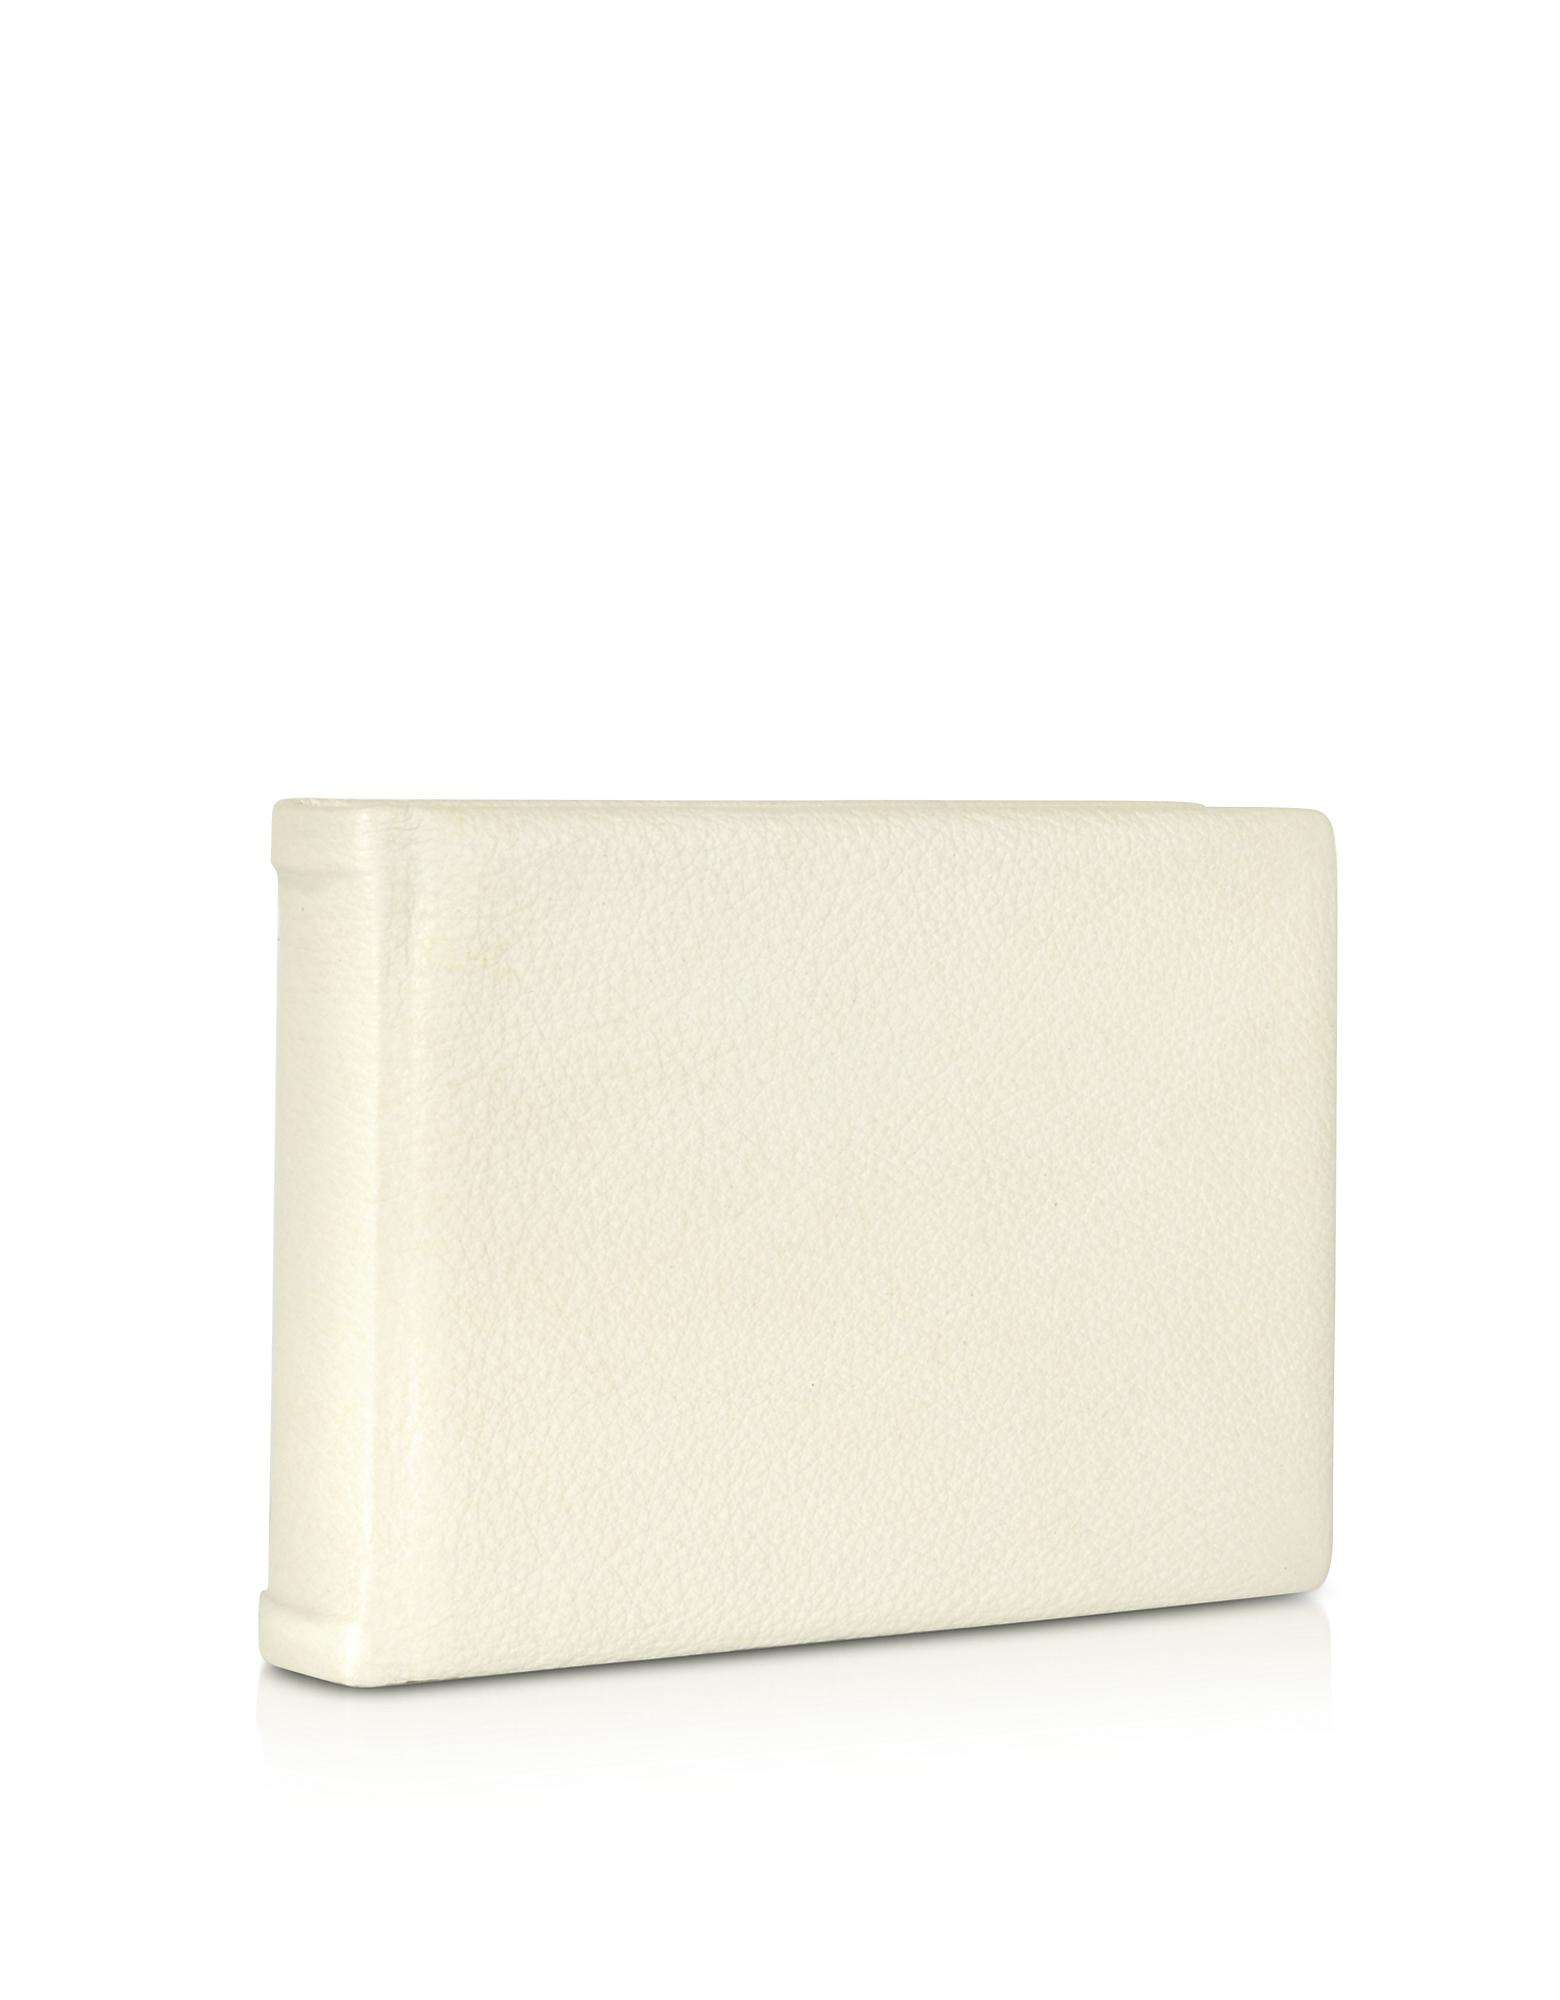 Pineider Small Ivory Leather Photo Album